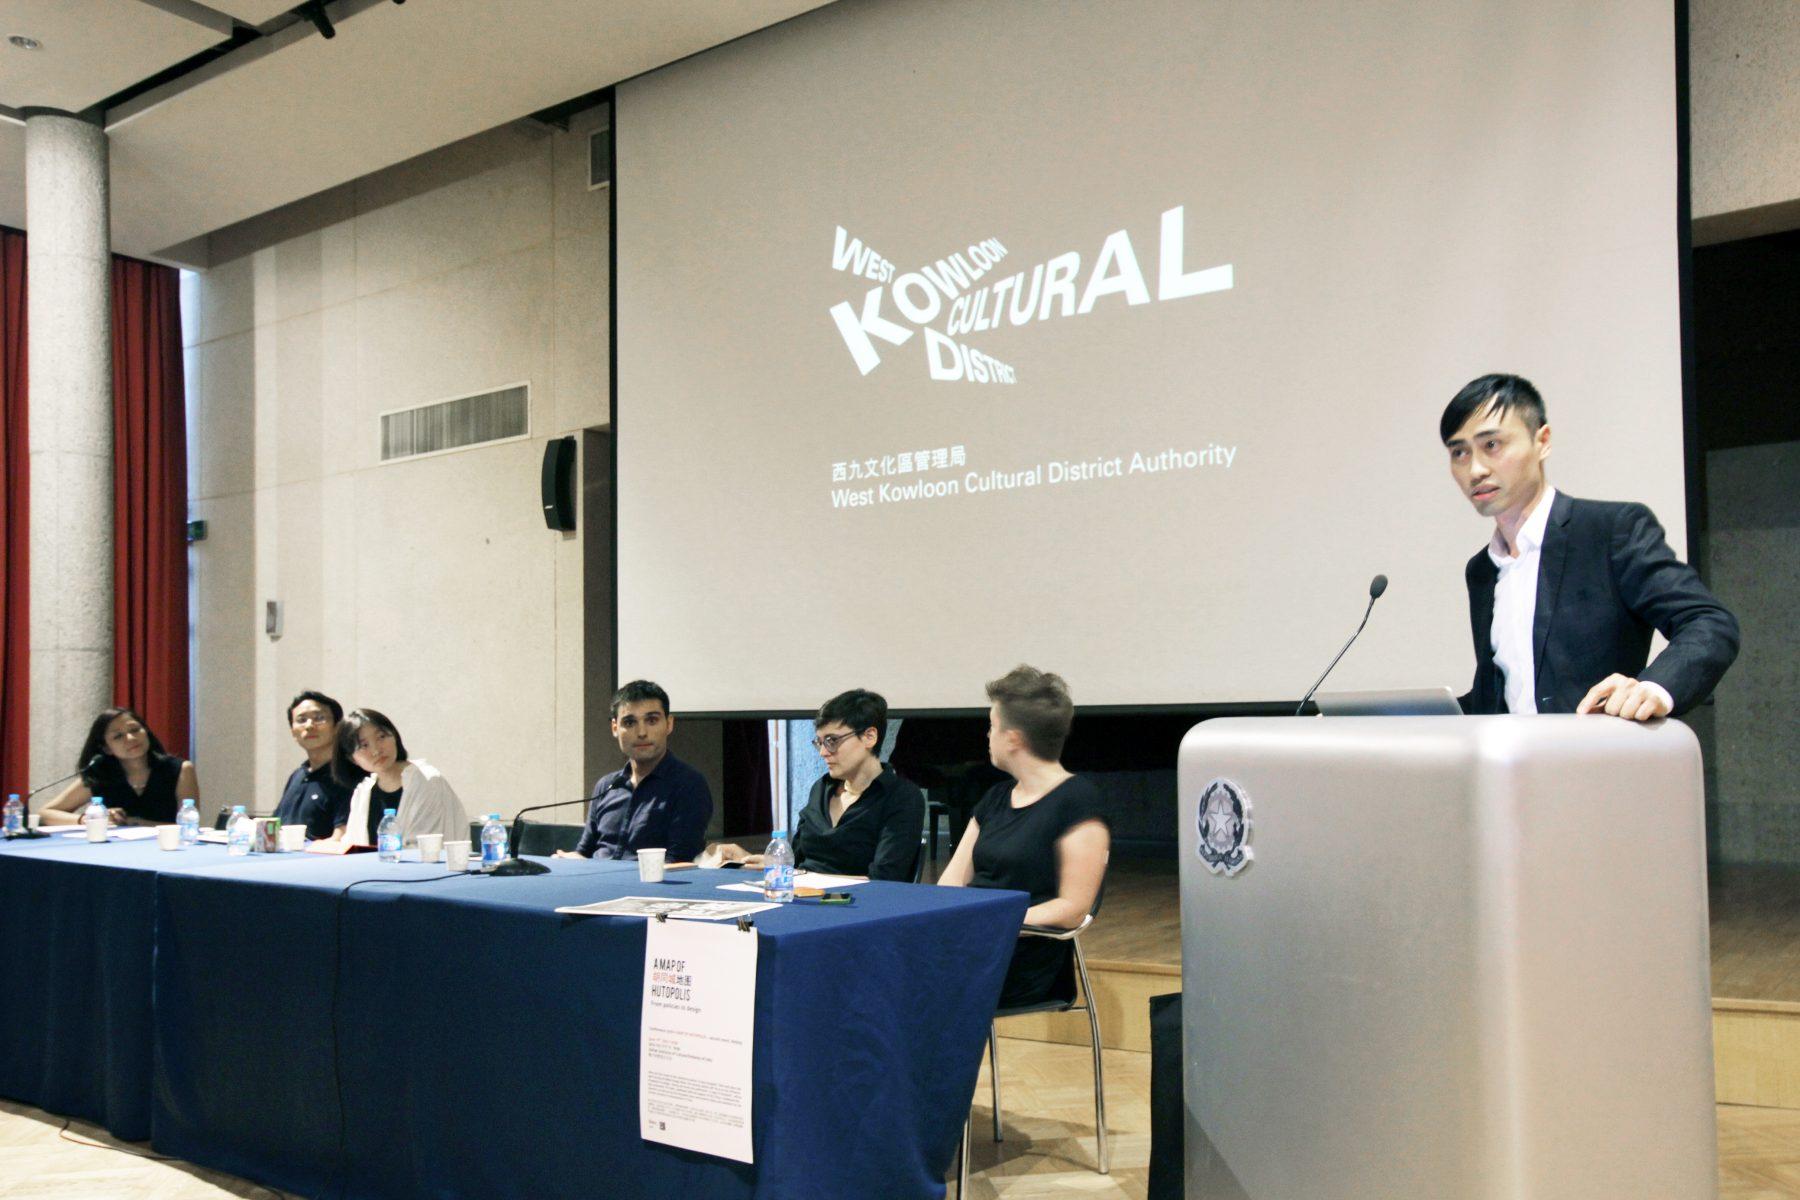 Matthew Hu, Toby Wong, Luis Aguirre Manso, Eugenia Murialdo, Celine Lamee